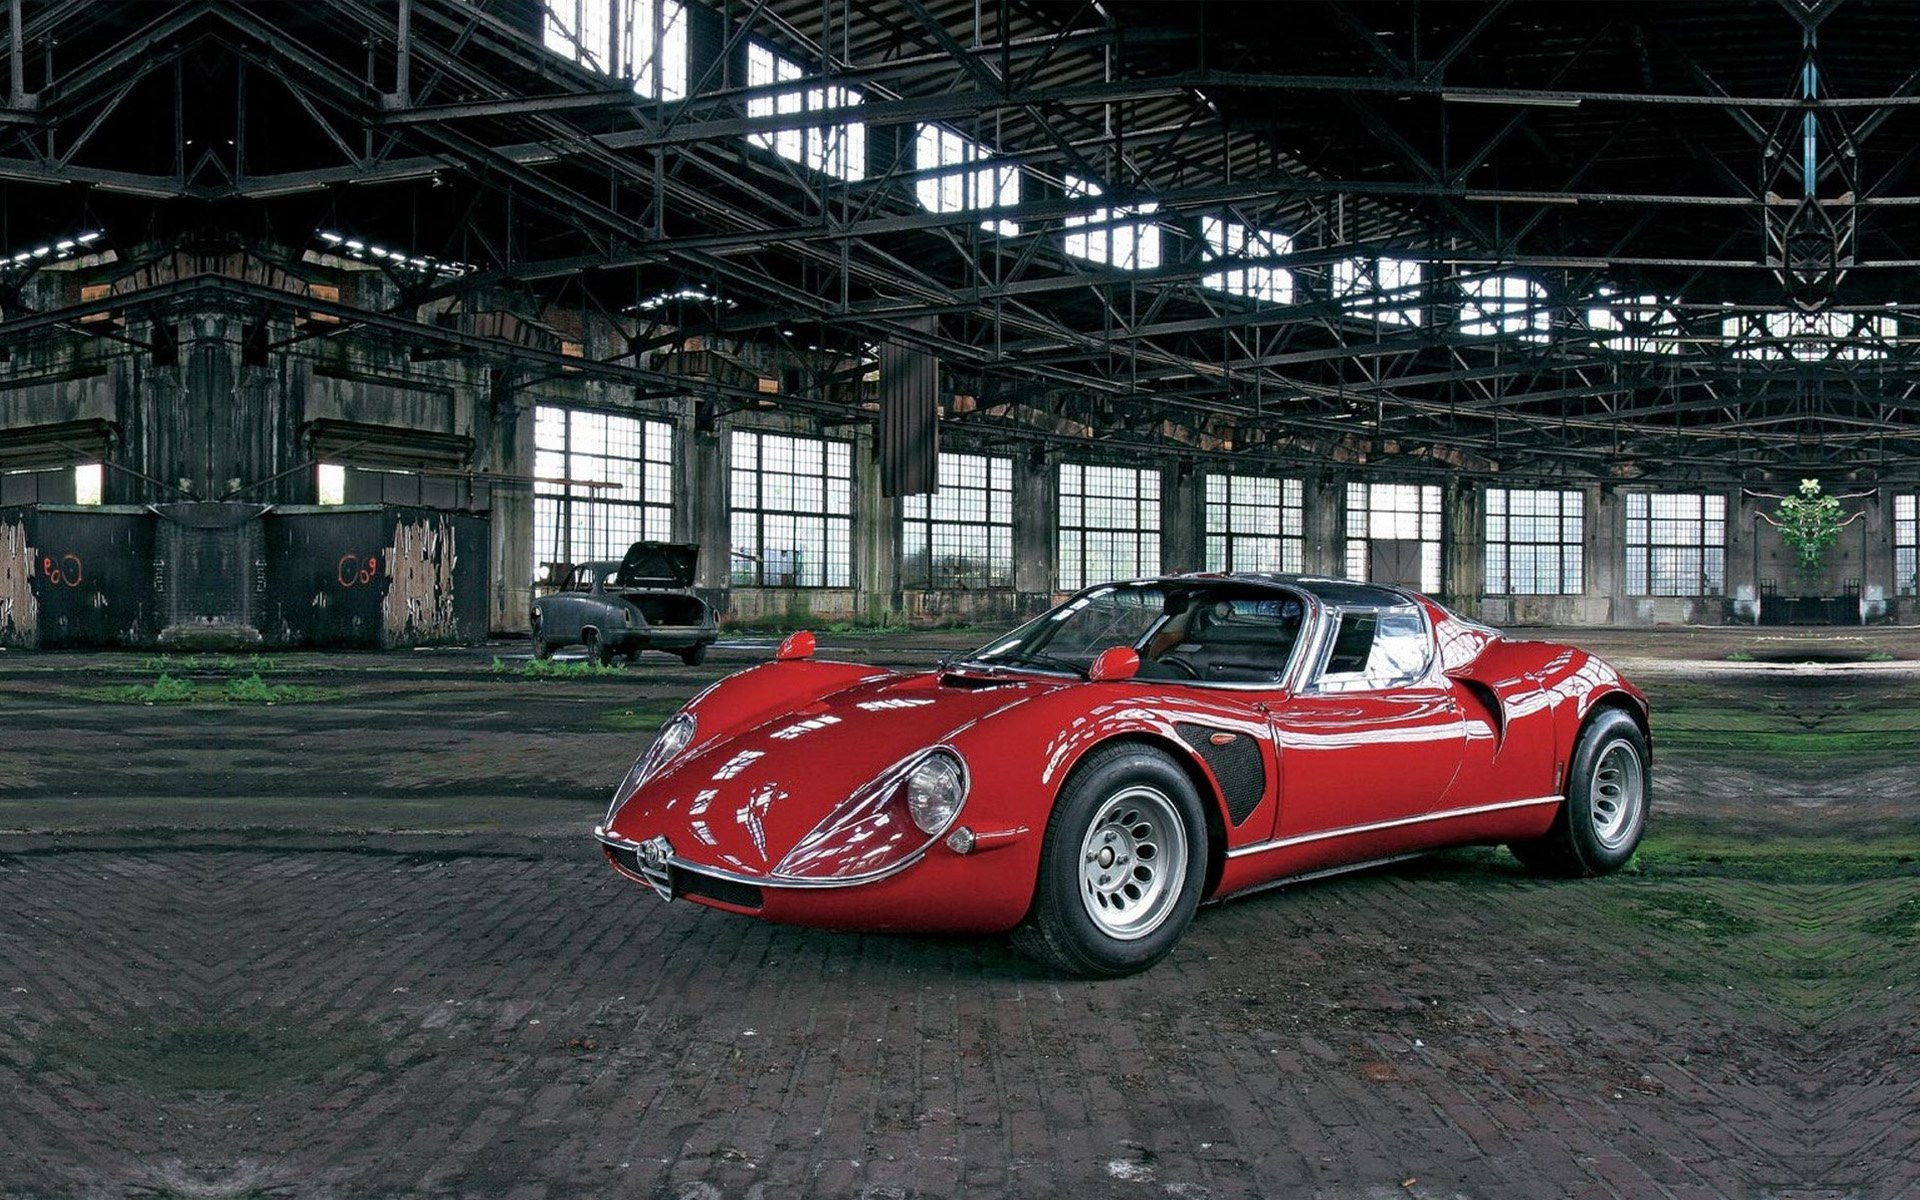 Afra sas  Alfa Romeo spare parts for classic and